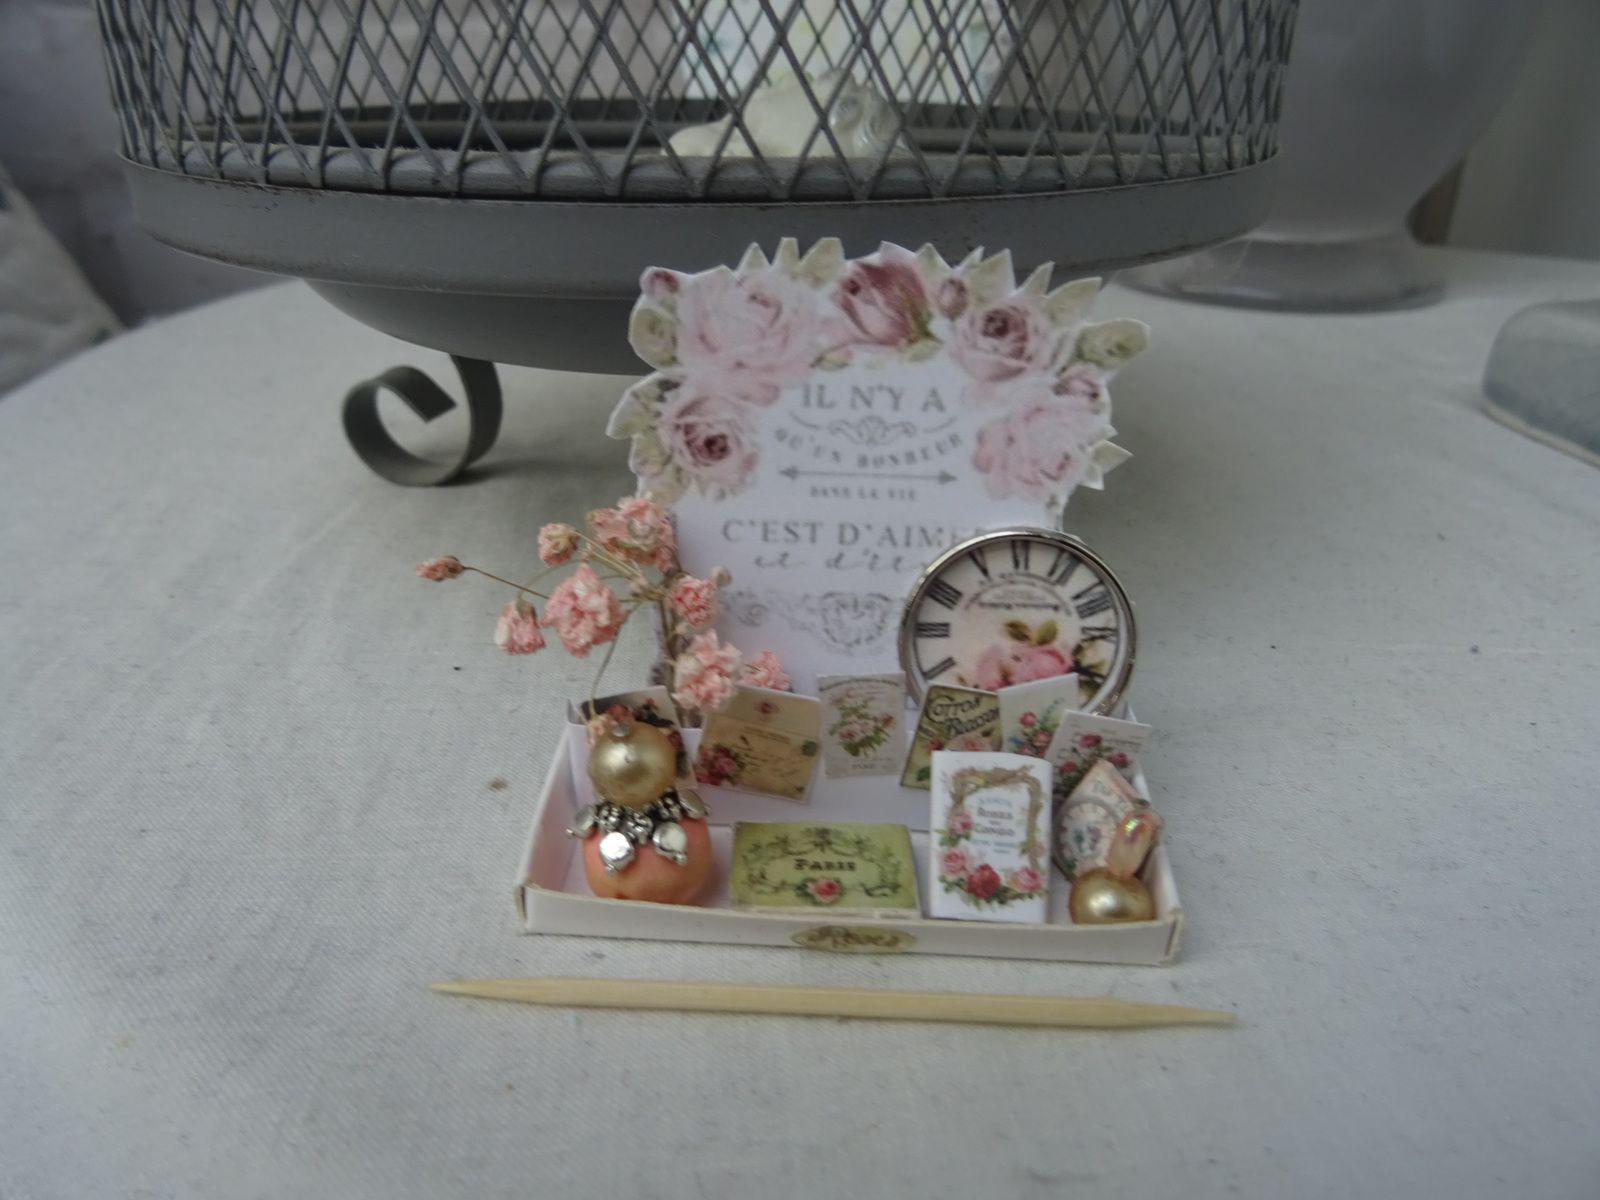 2 petits présentoirs miniature